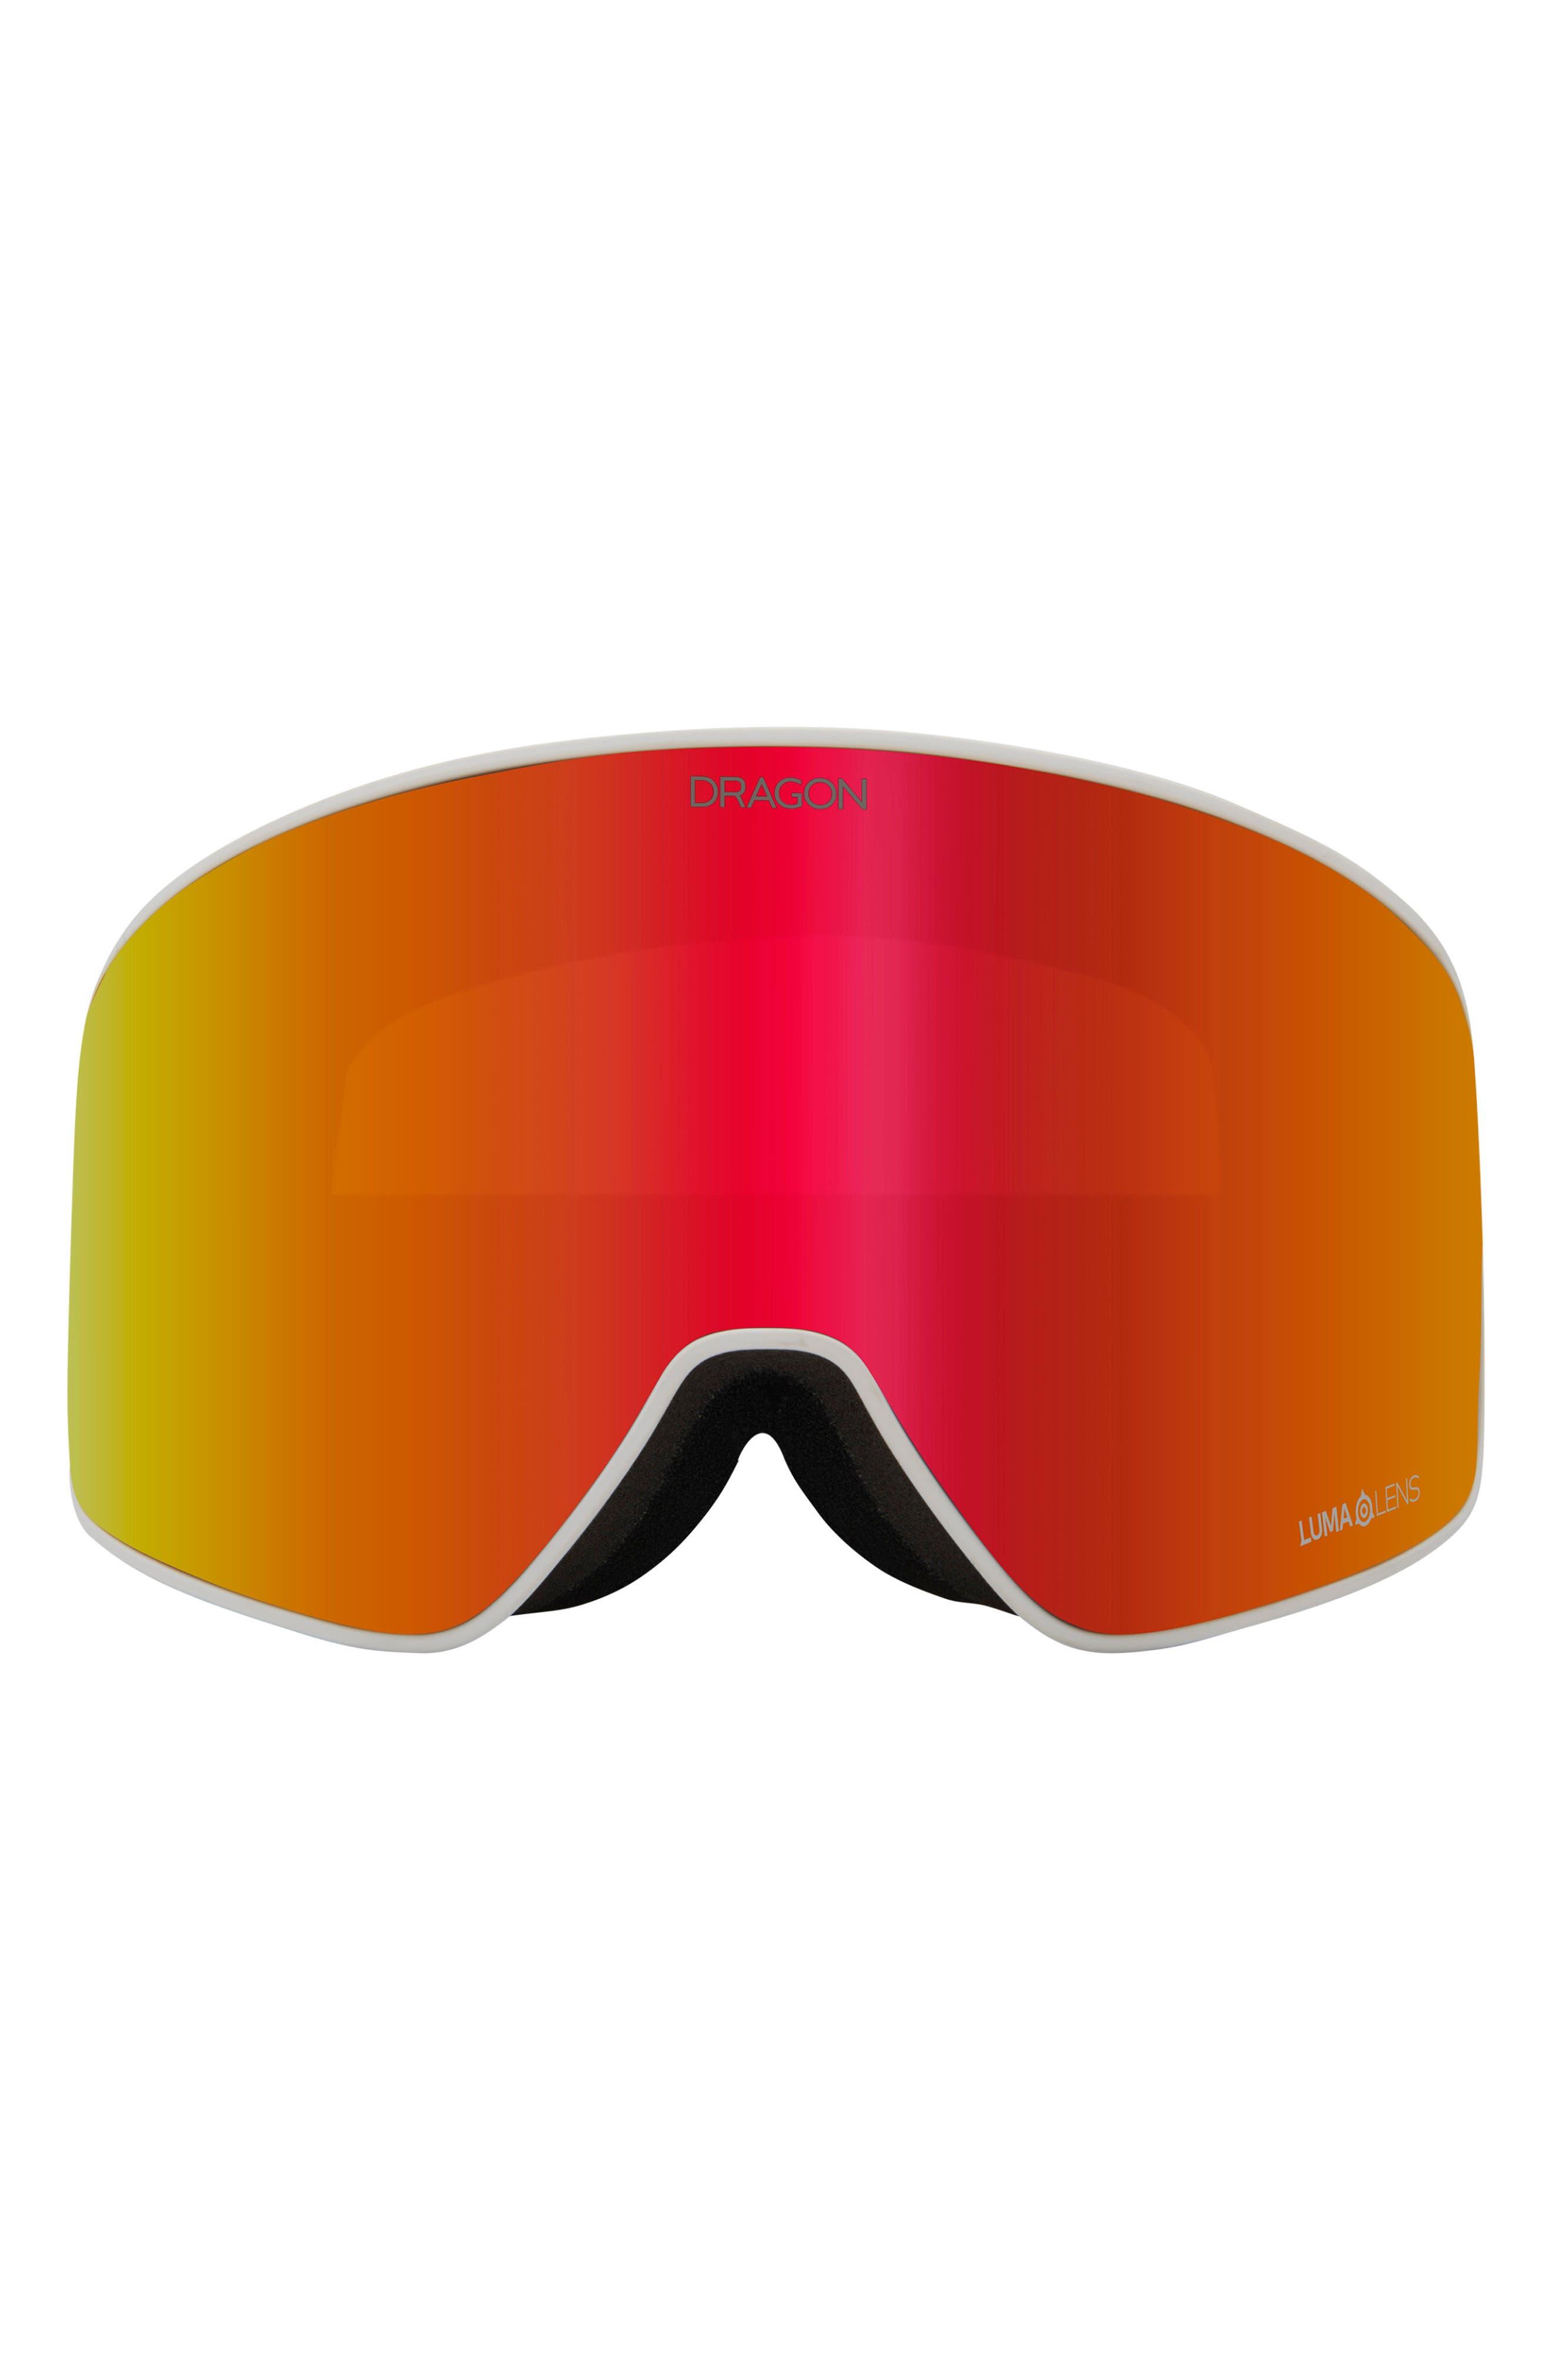 Pxv2 62mm Snow Goggles With Bonus Lens